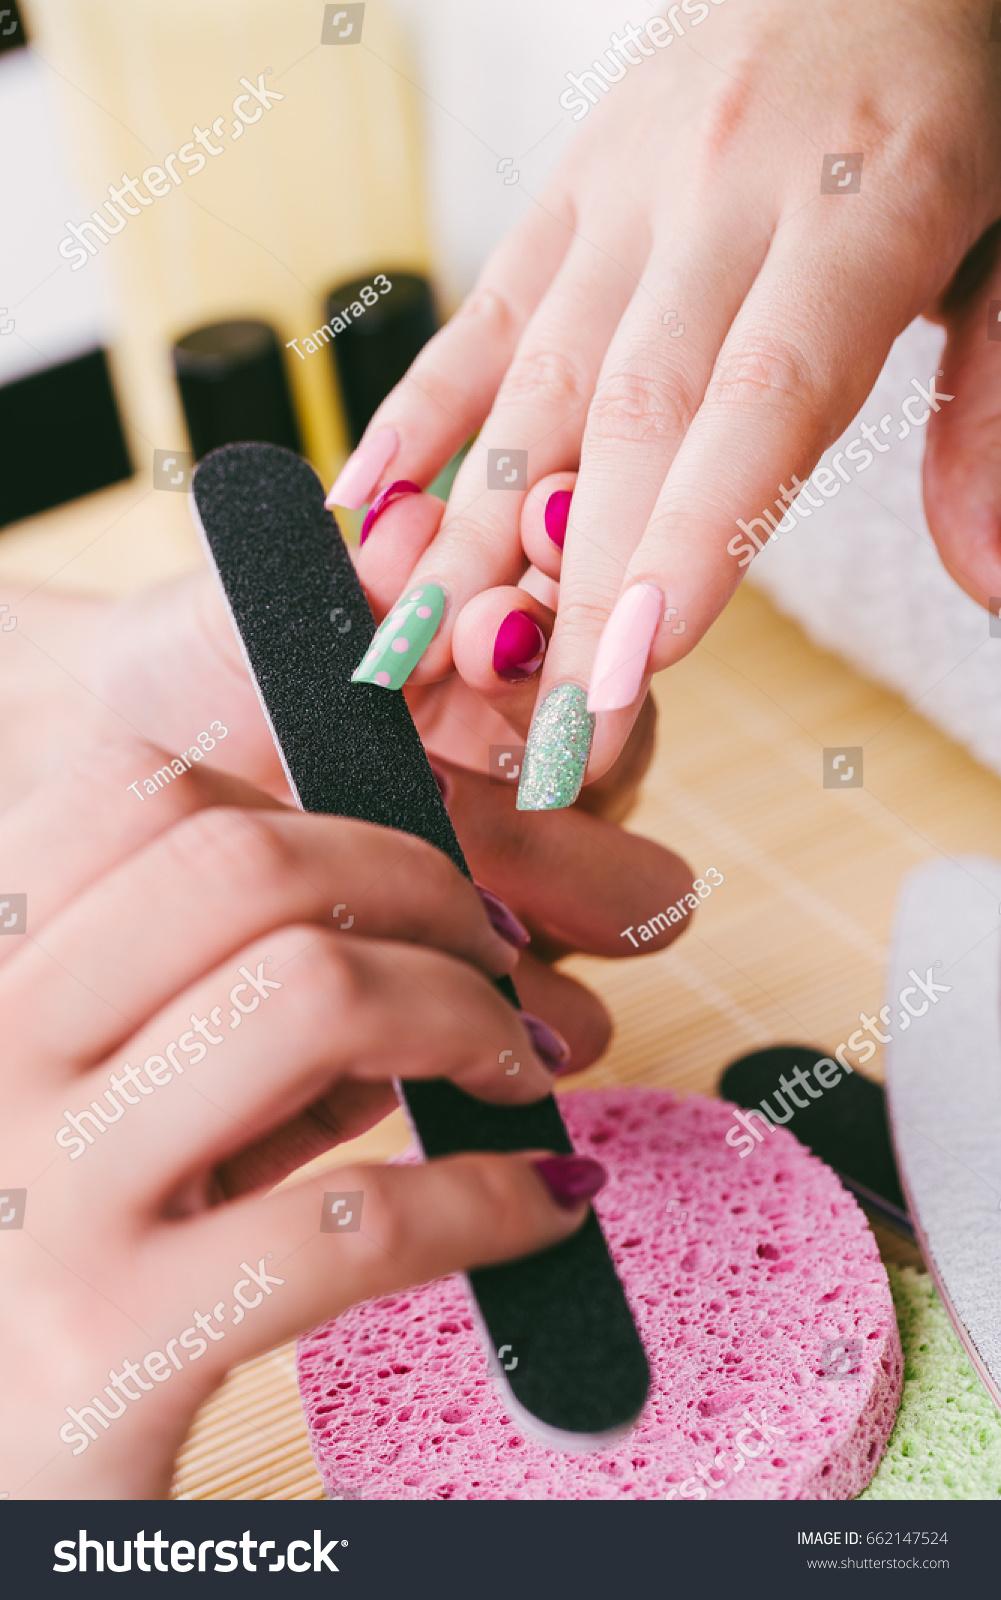 Manicure Beauty Treatment Photo Nice Manicured Stock Photo (Royalty ...